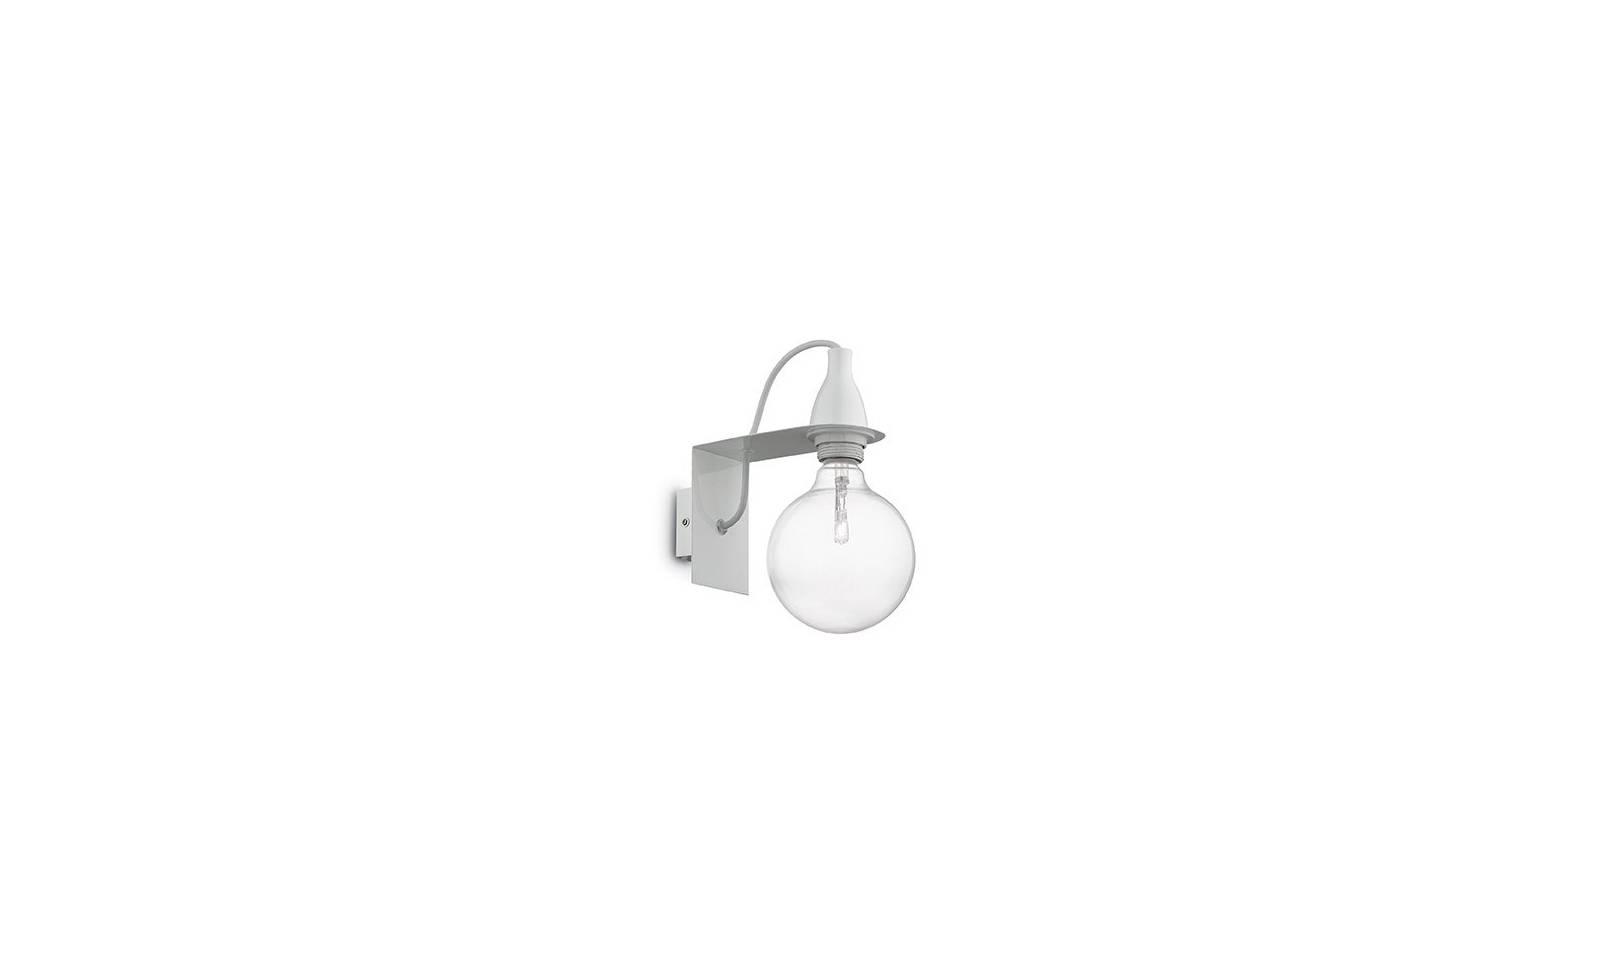 Ideal lux modern wall lamp Minimal